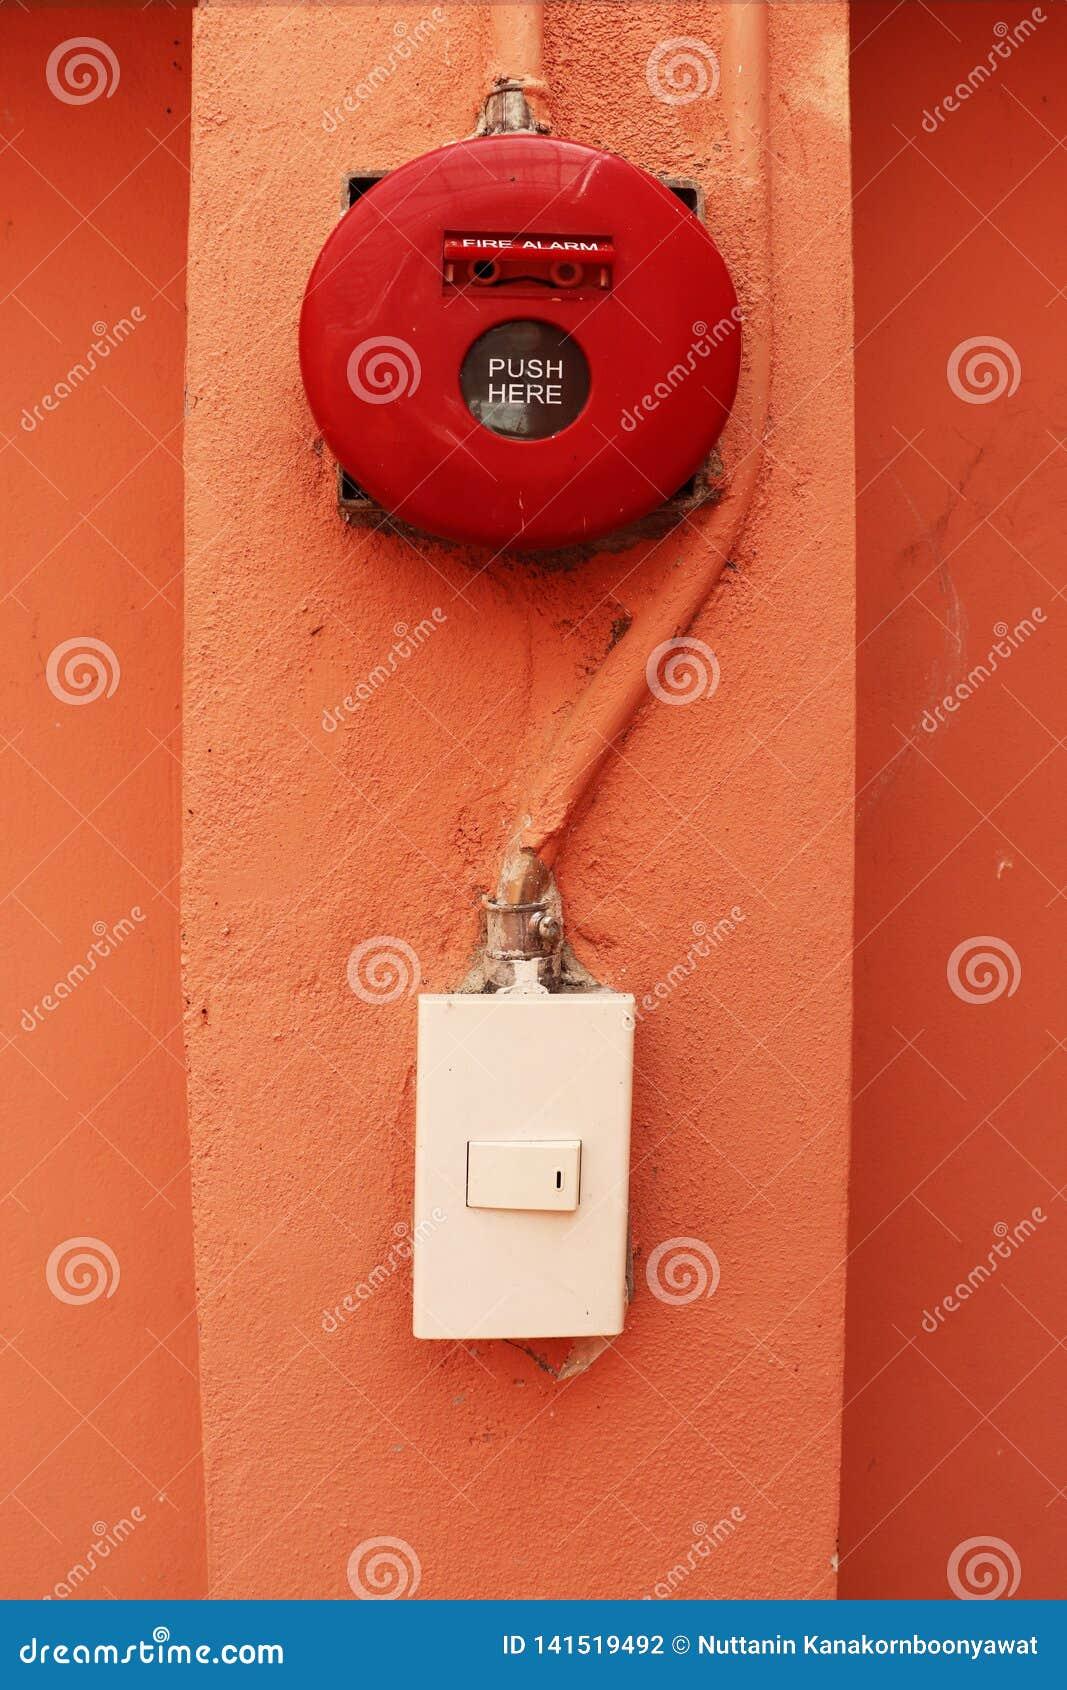 Red fire alarm on orange wall